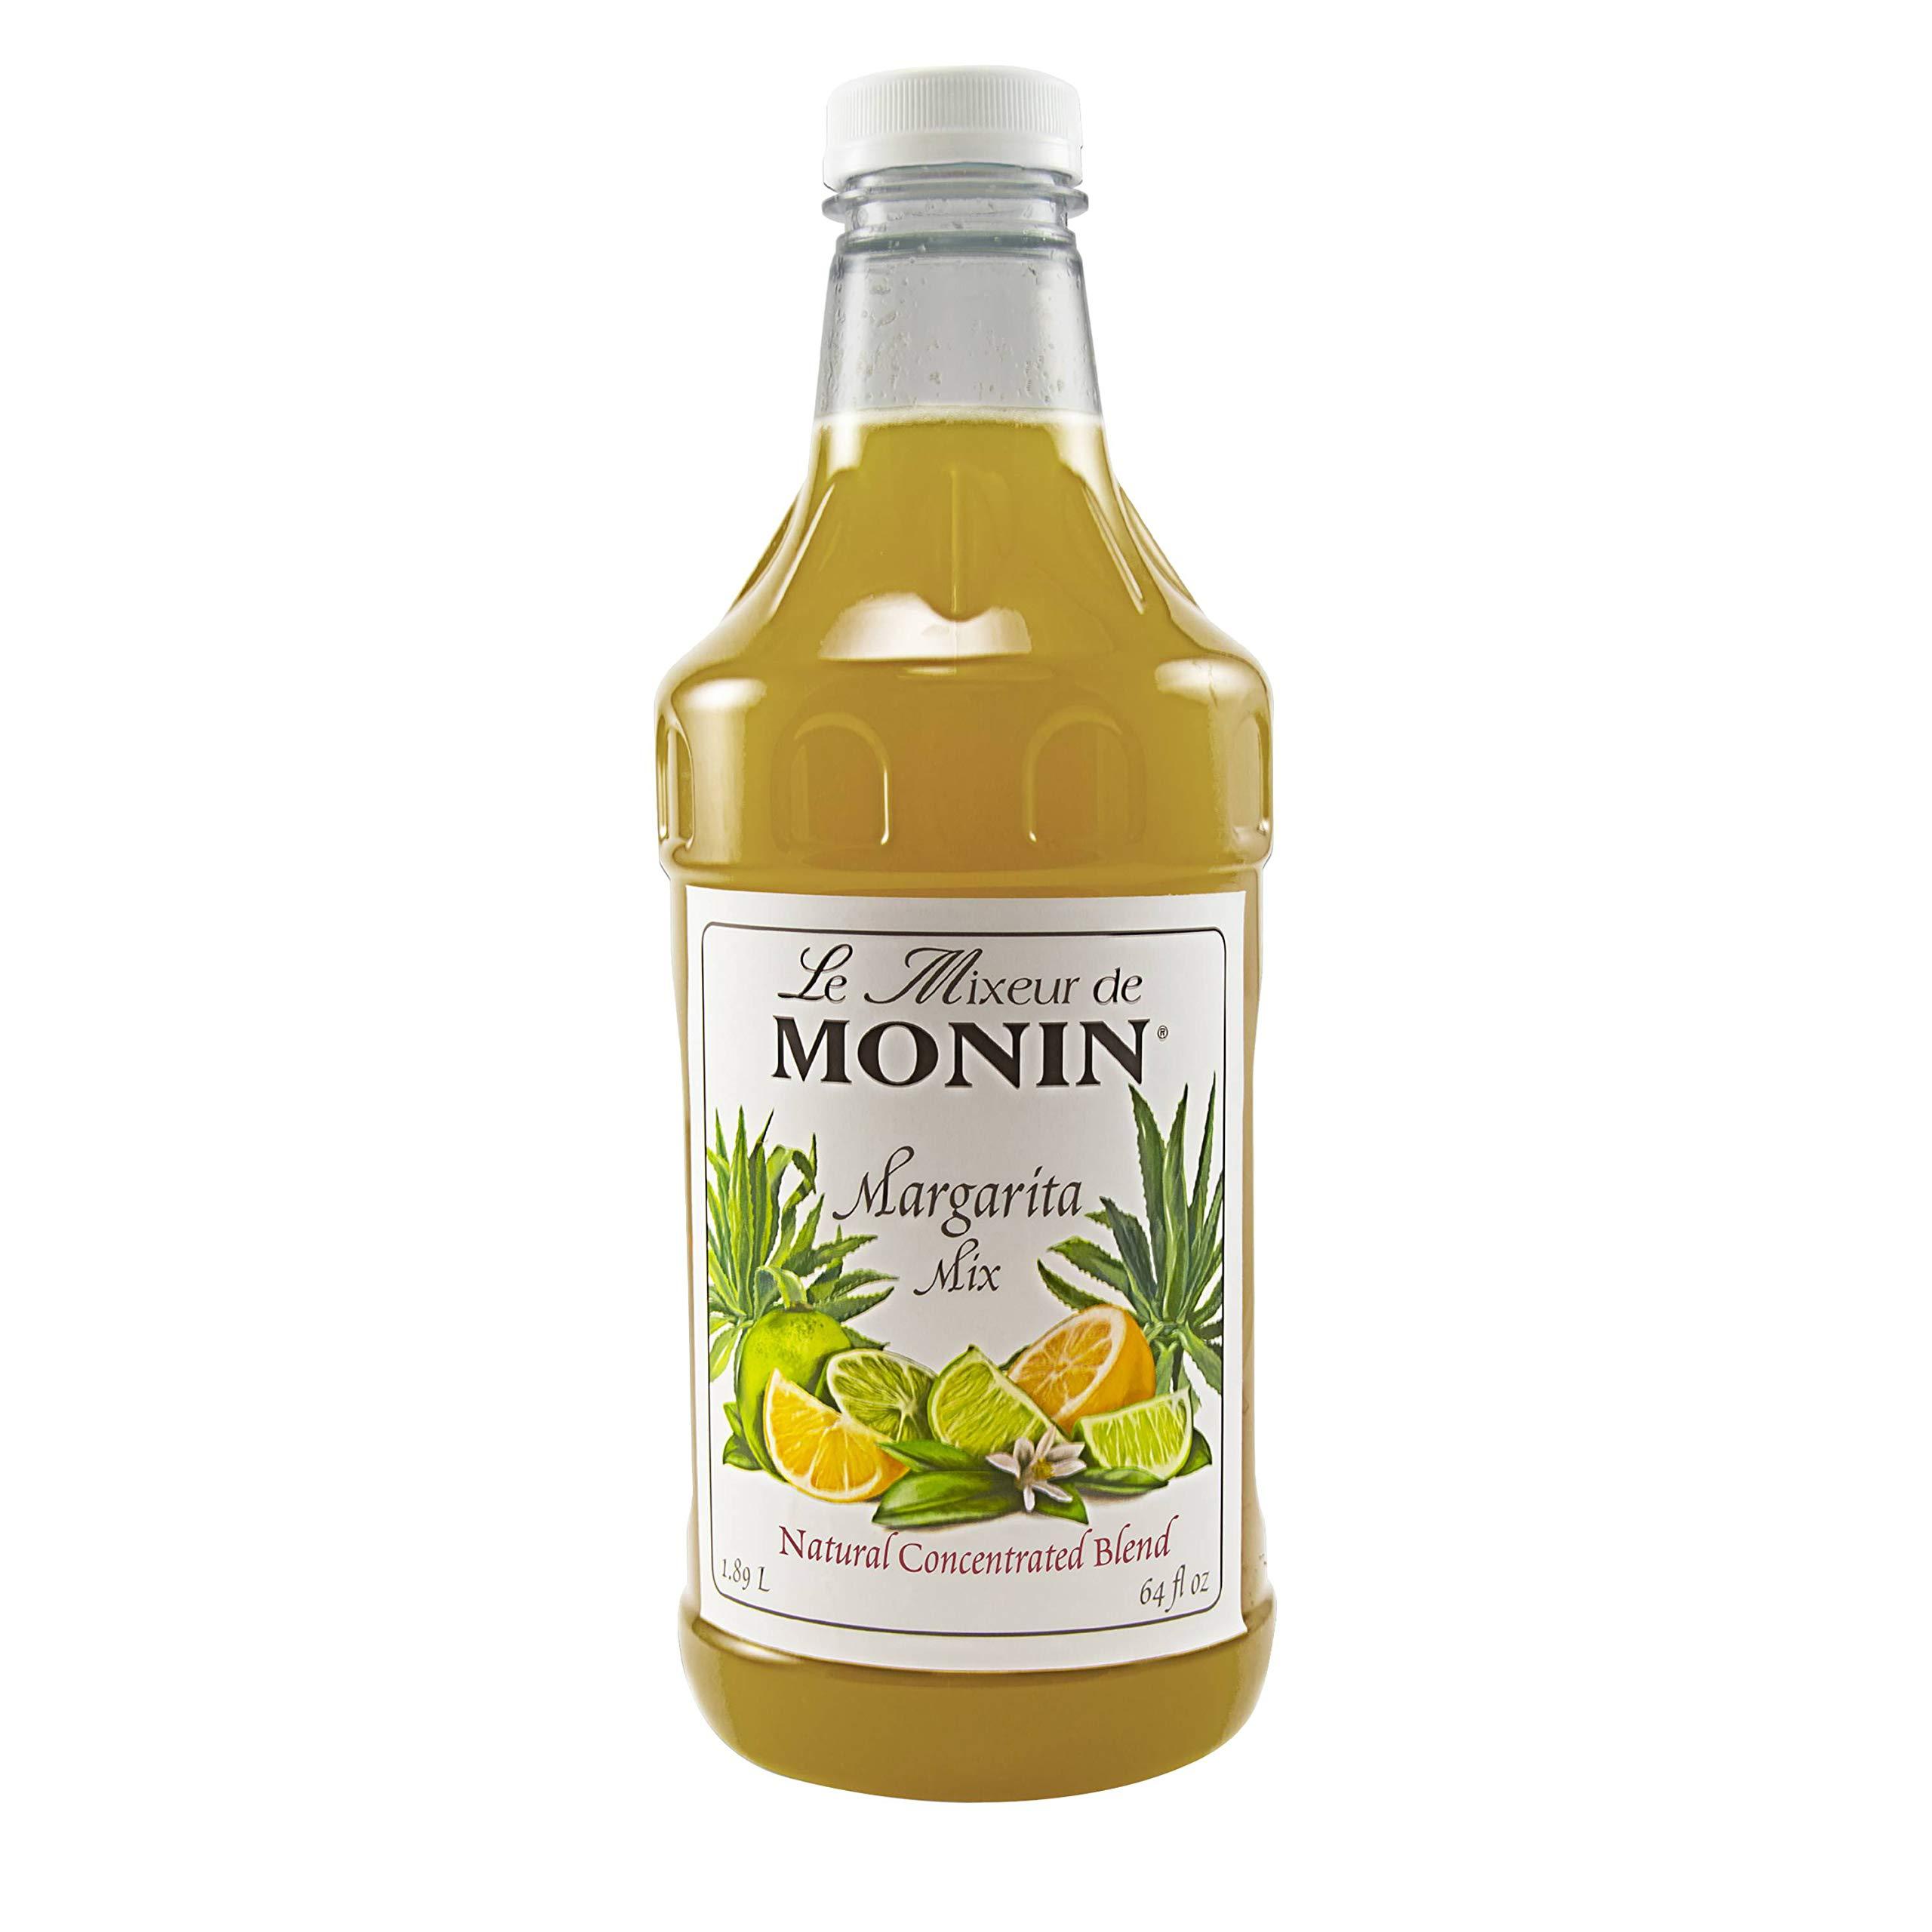 Monin Margarita Mix, 1. 89 Liter -- 4 per case.